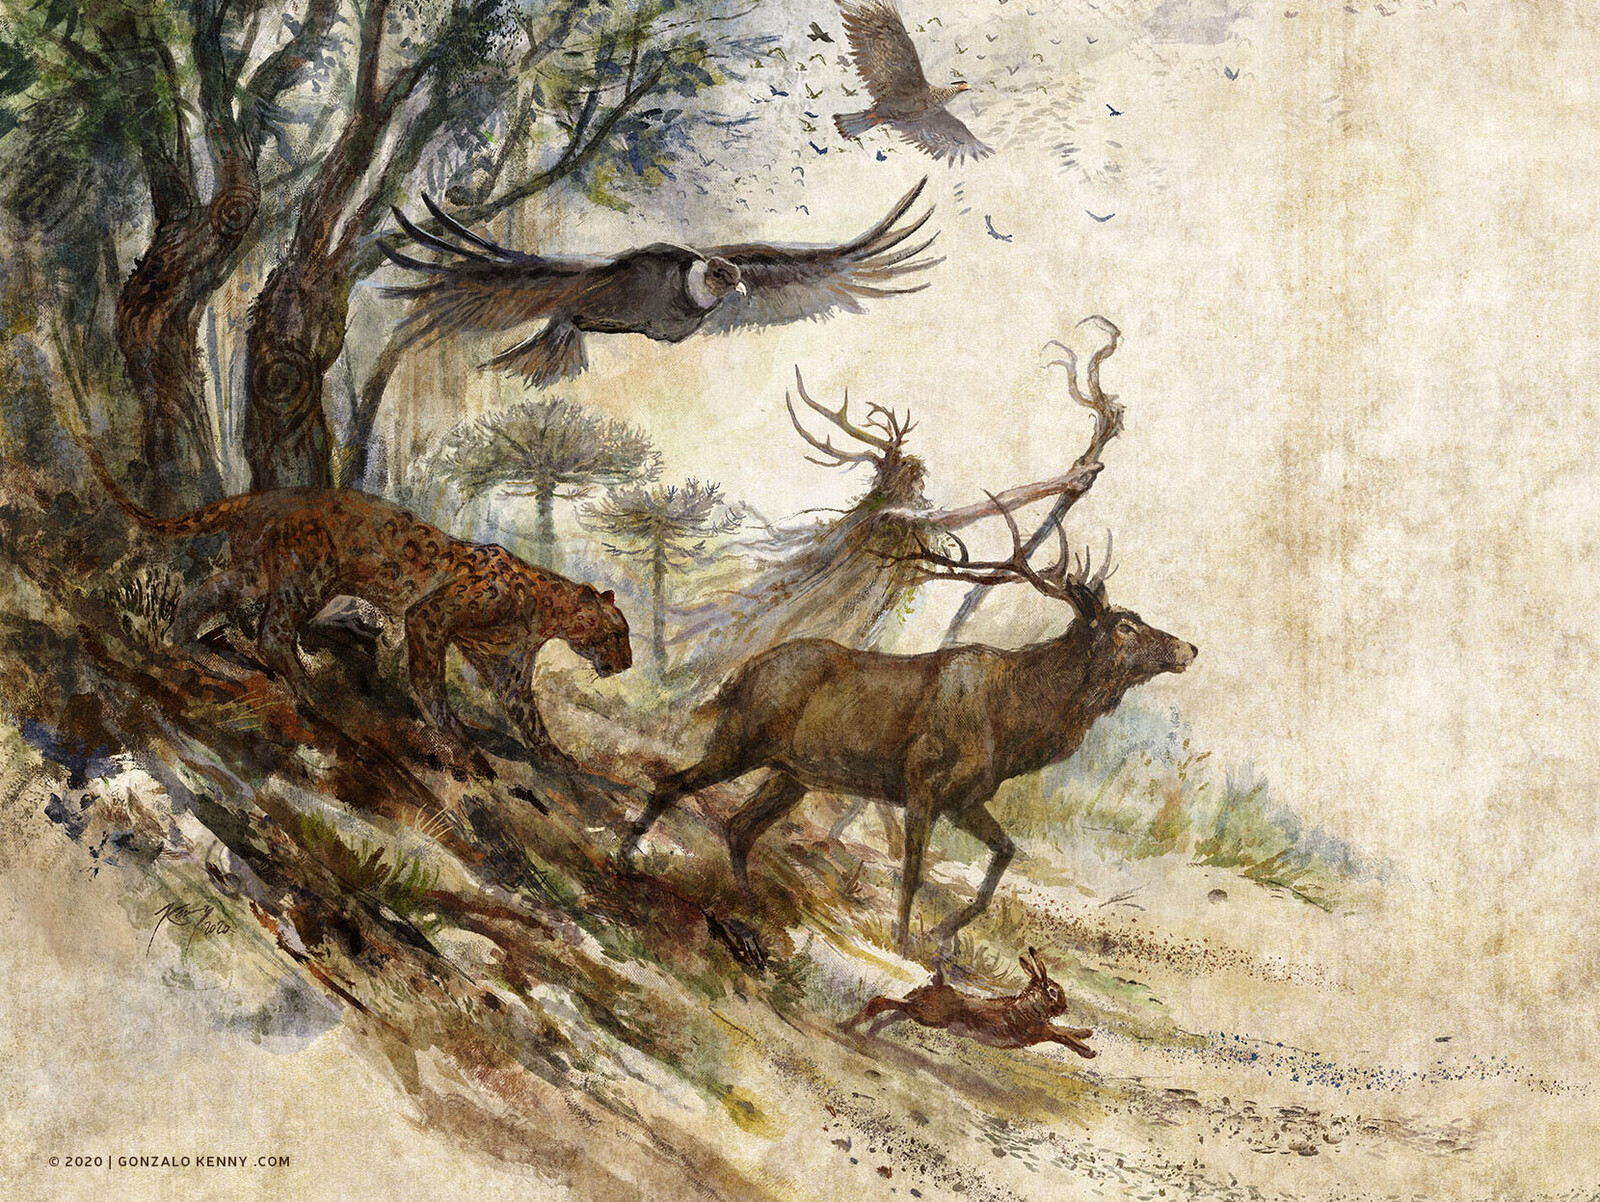 Kupuka guiando al Bosque